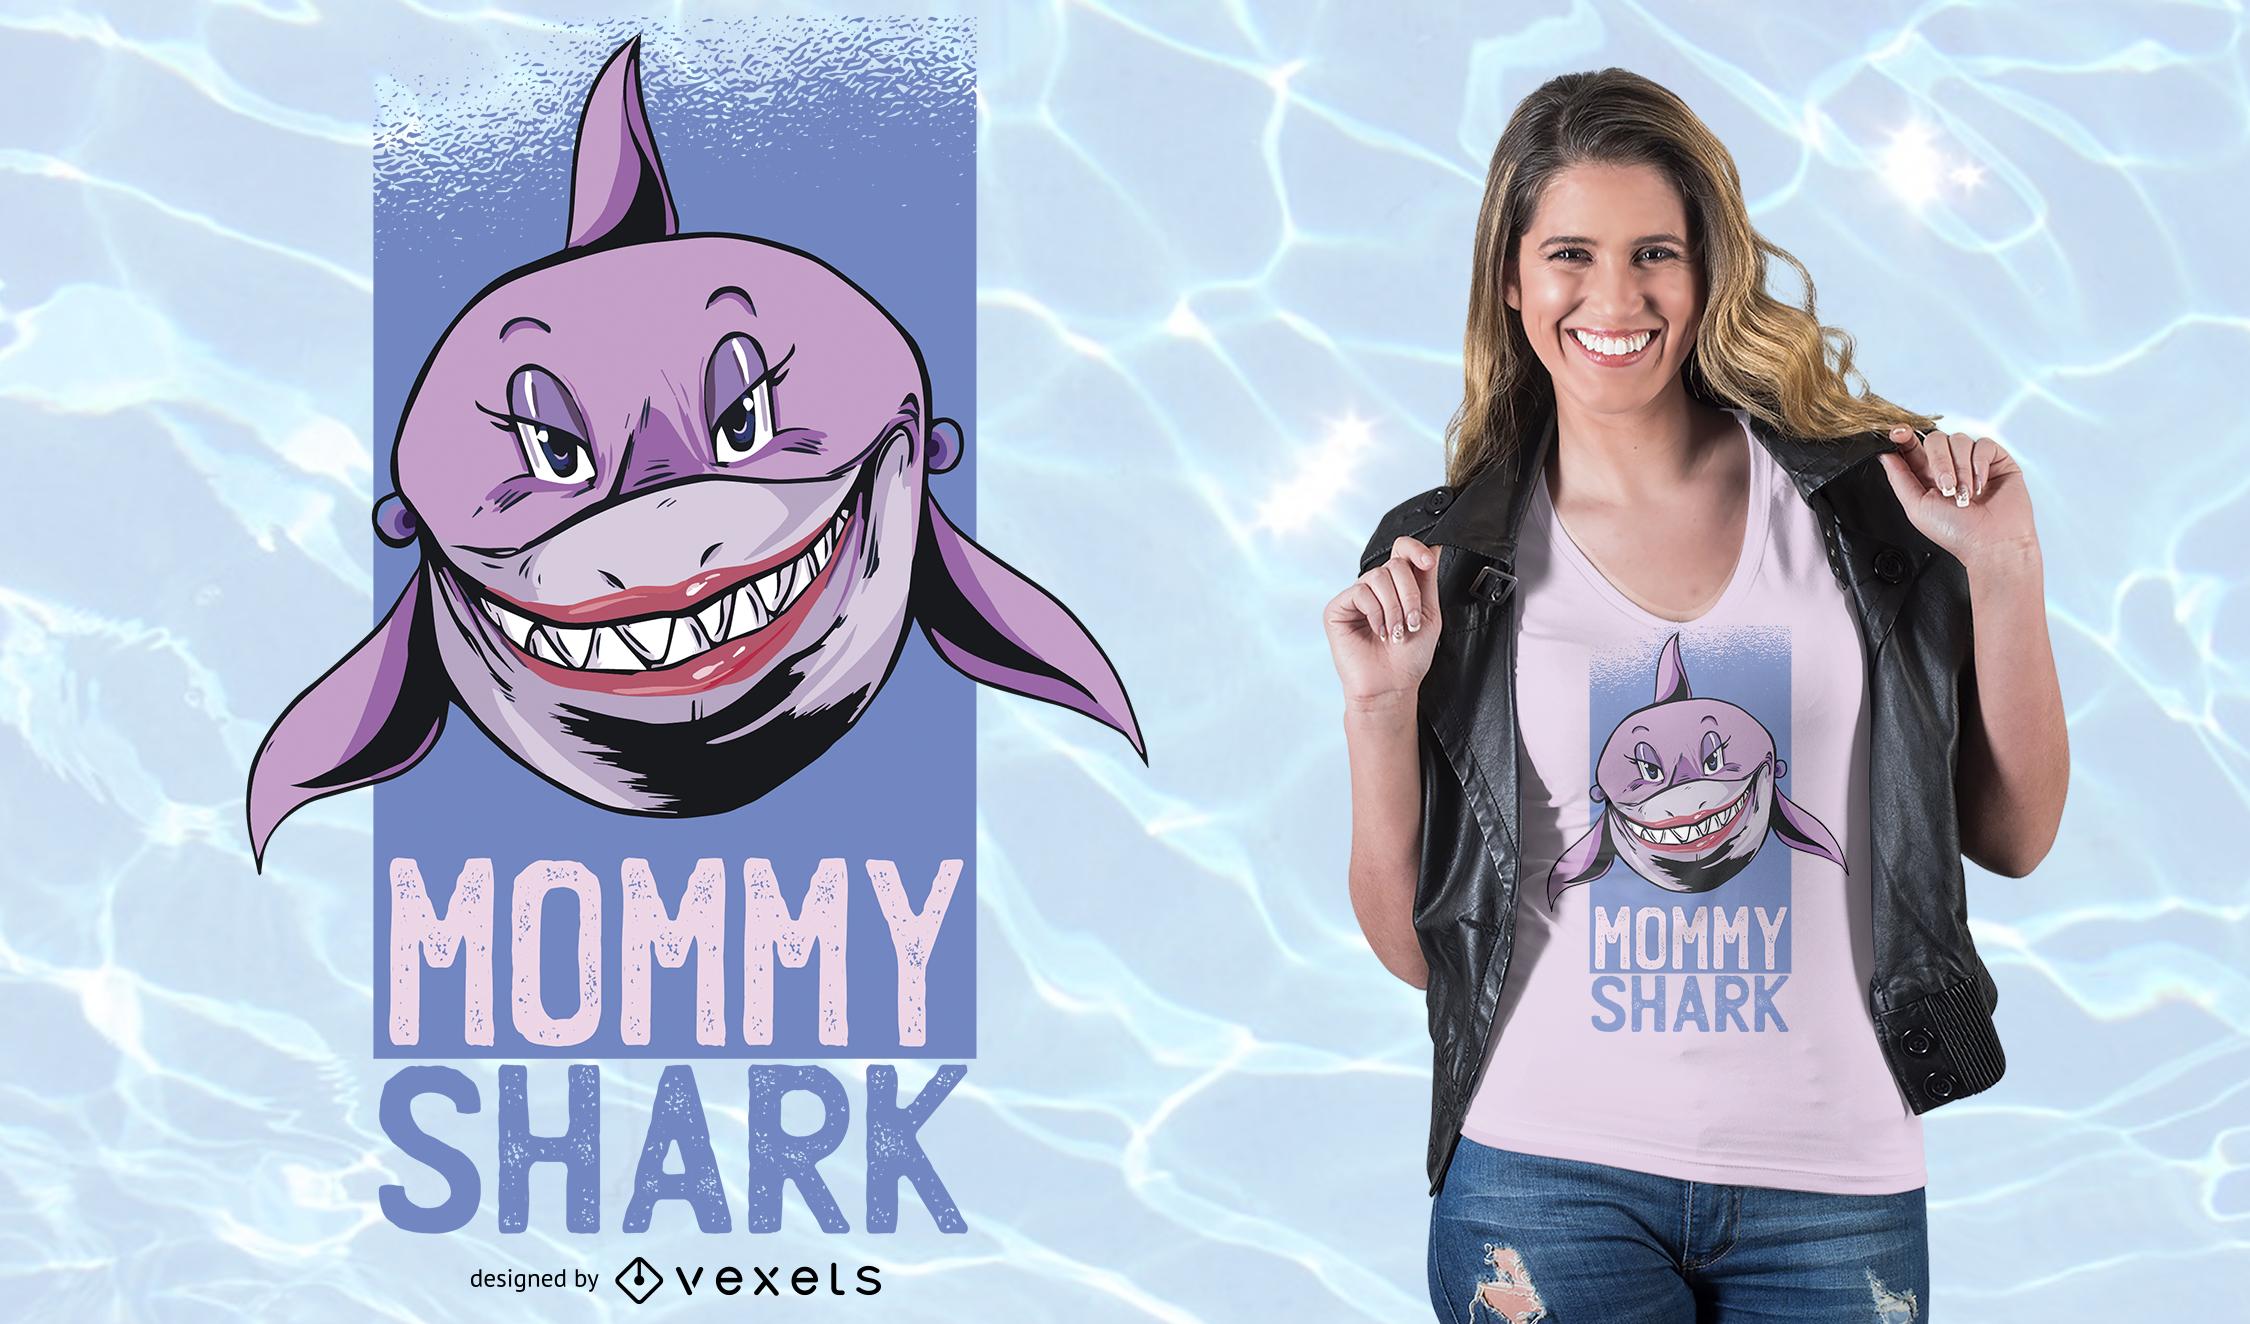 Mommy Shark T-Shirt Design